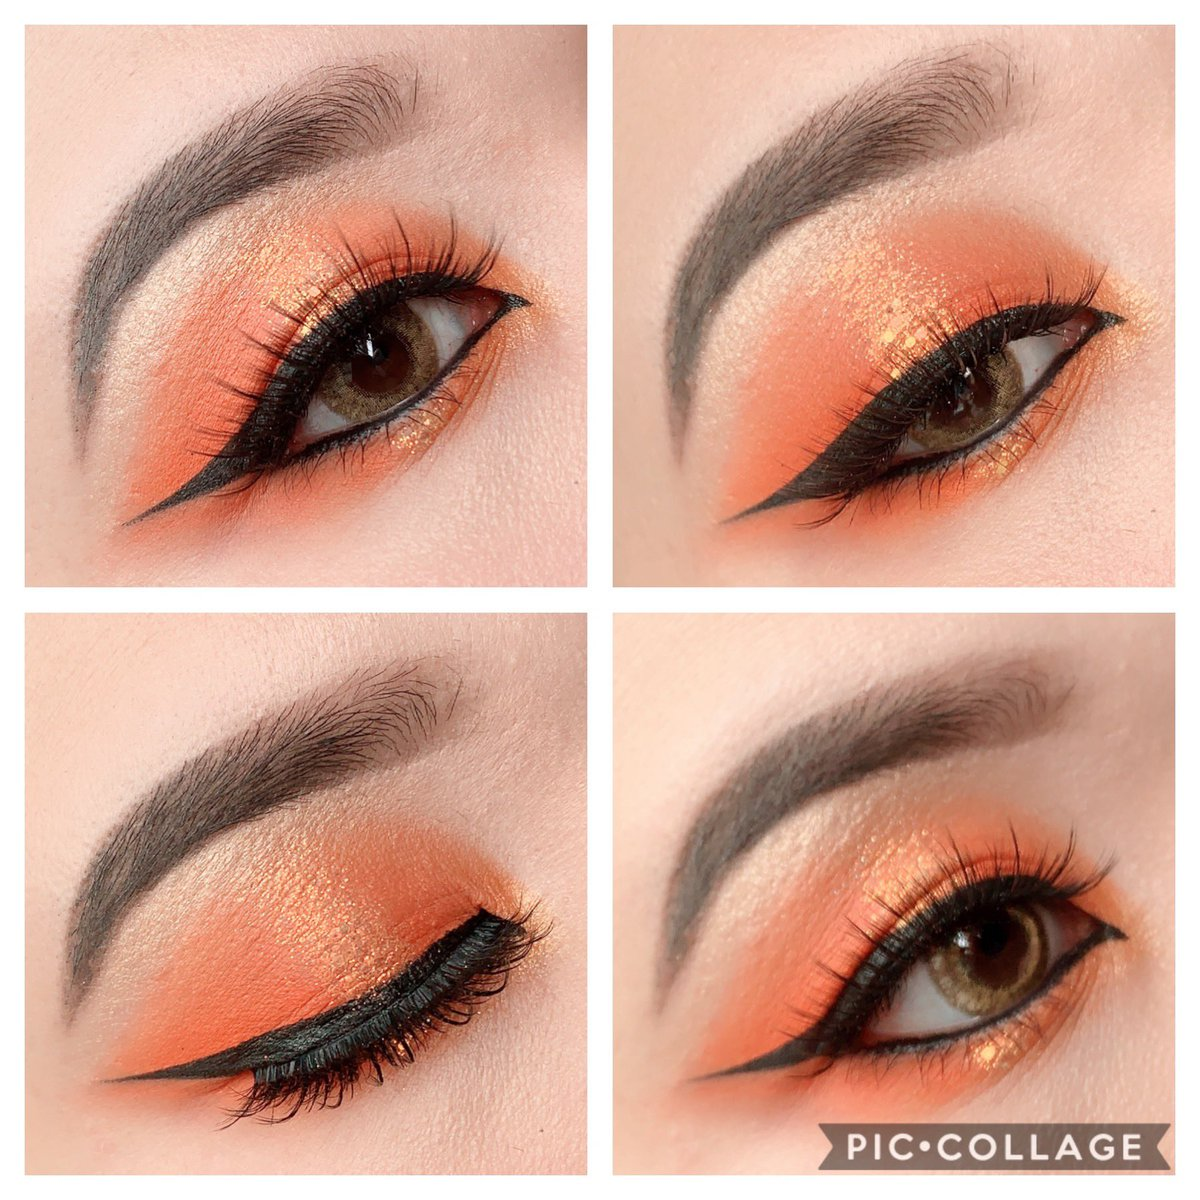 Orange 🍊 makeup   オレンジメイクリクエストがあったから やったよぉ🧡🧡🧡  Eyeshadow @ColourPopCo Orange You Glad?Palette🧡  Colour contact @lilyanna_shop LILMOON CRAEMBEIGE  #make #メイク #カラポ #リリーアンナ公式アンバサダー #LILMOON #CREAMBEIGE #リルムーン #クリームベージュ